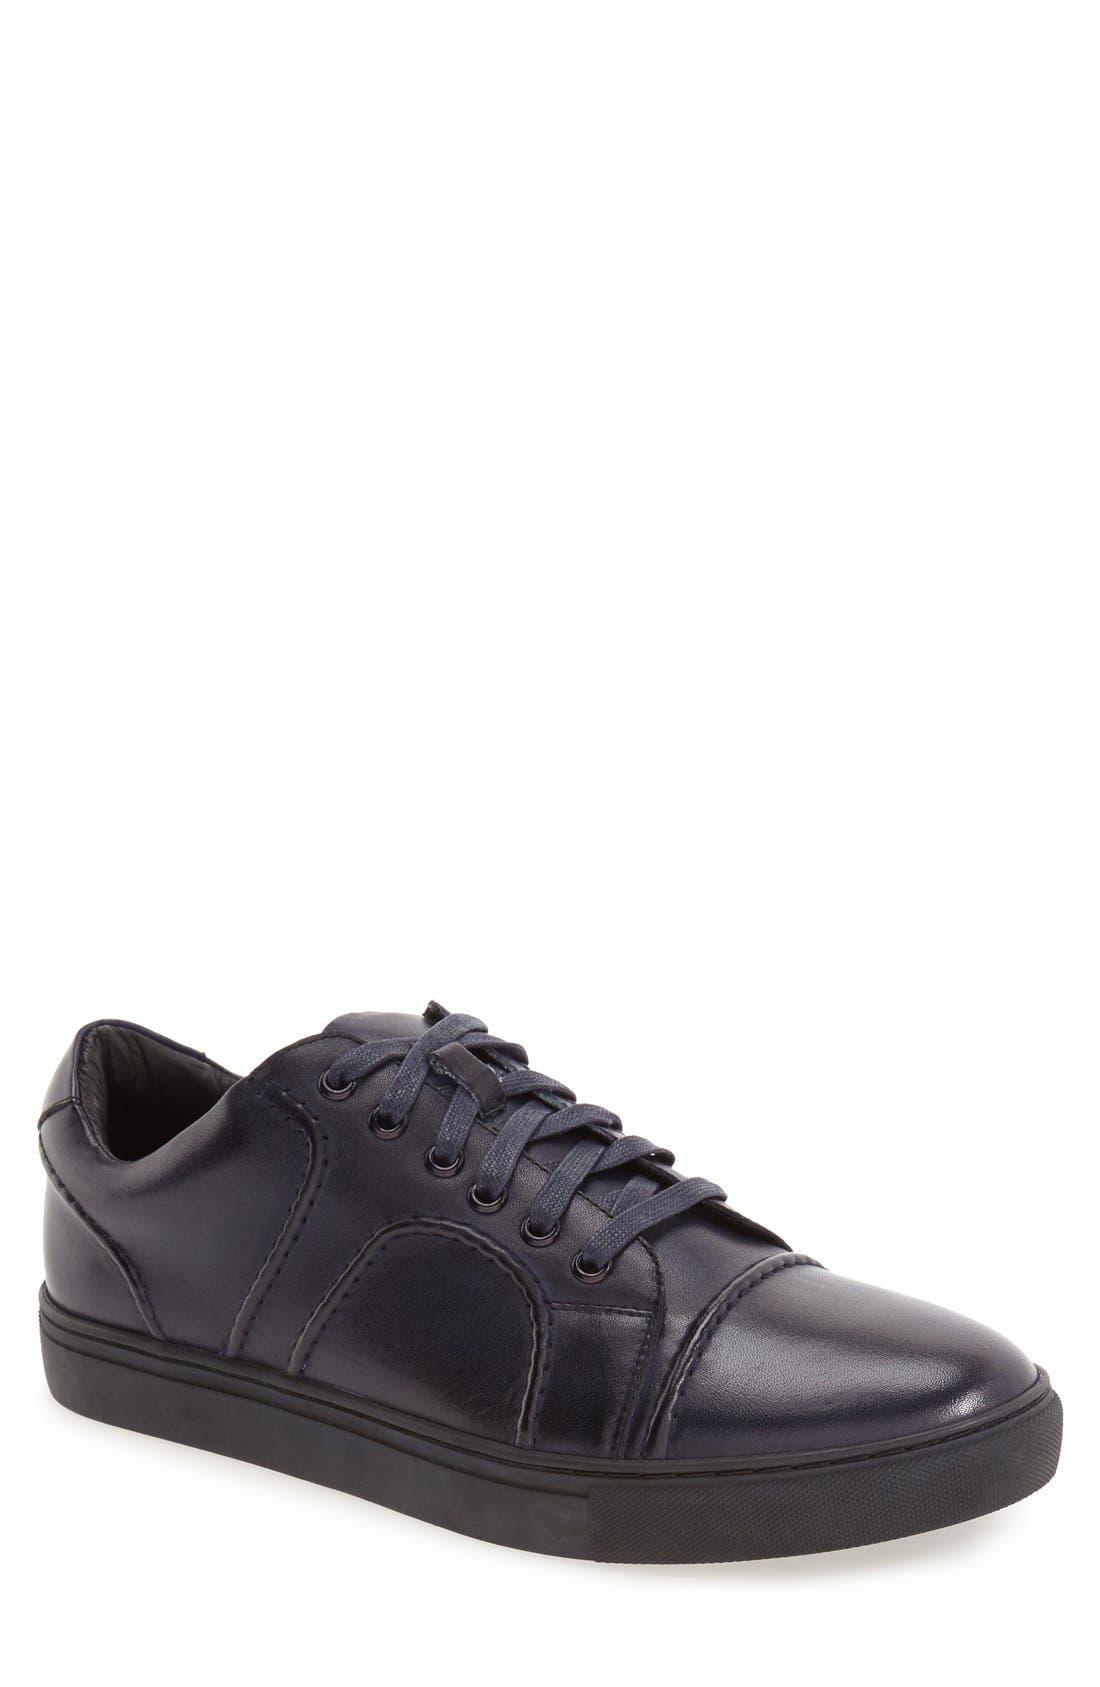 Alternate Image 1 Selected - Zanzara 'Echo' Sneaker (Men)